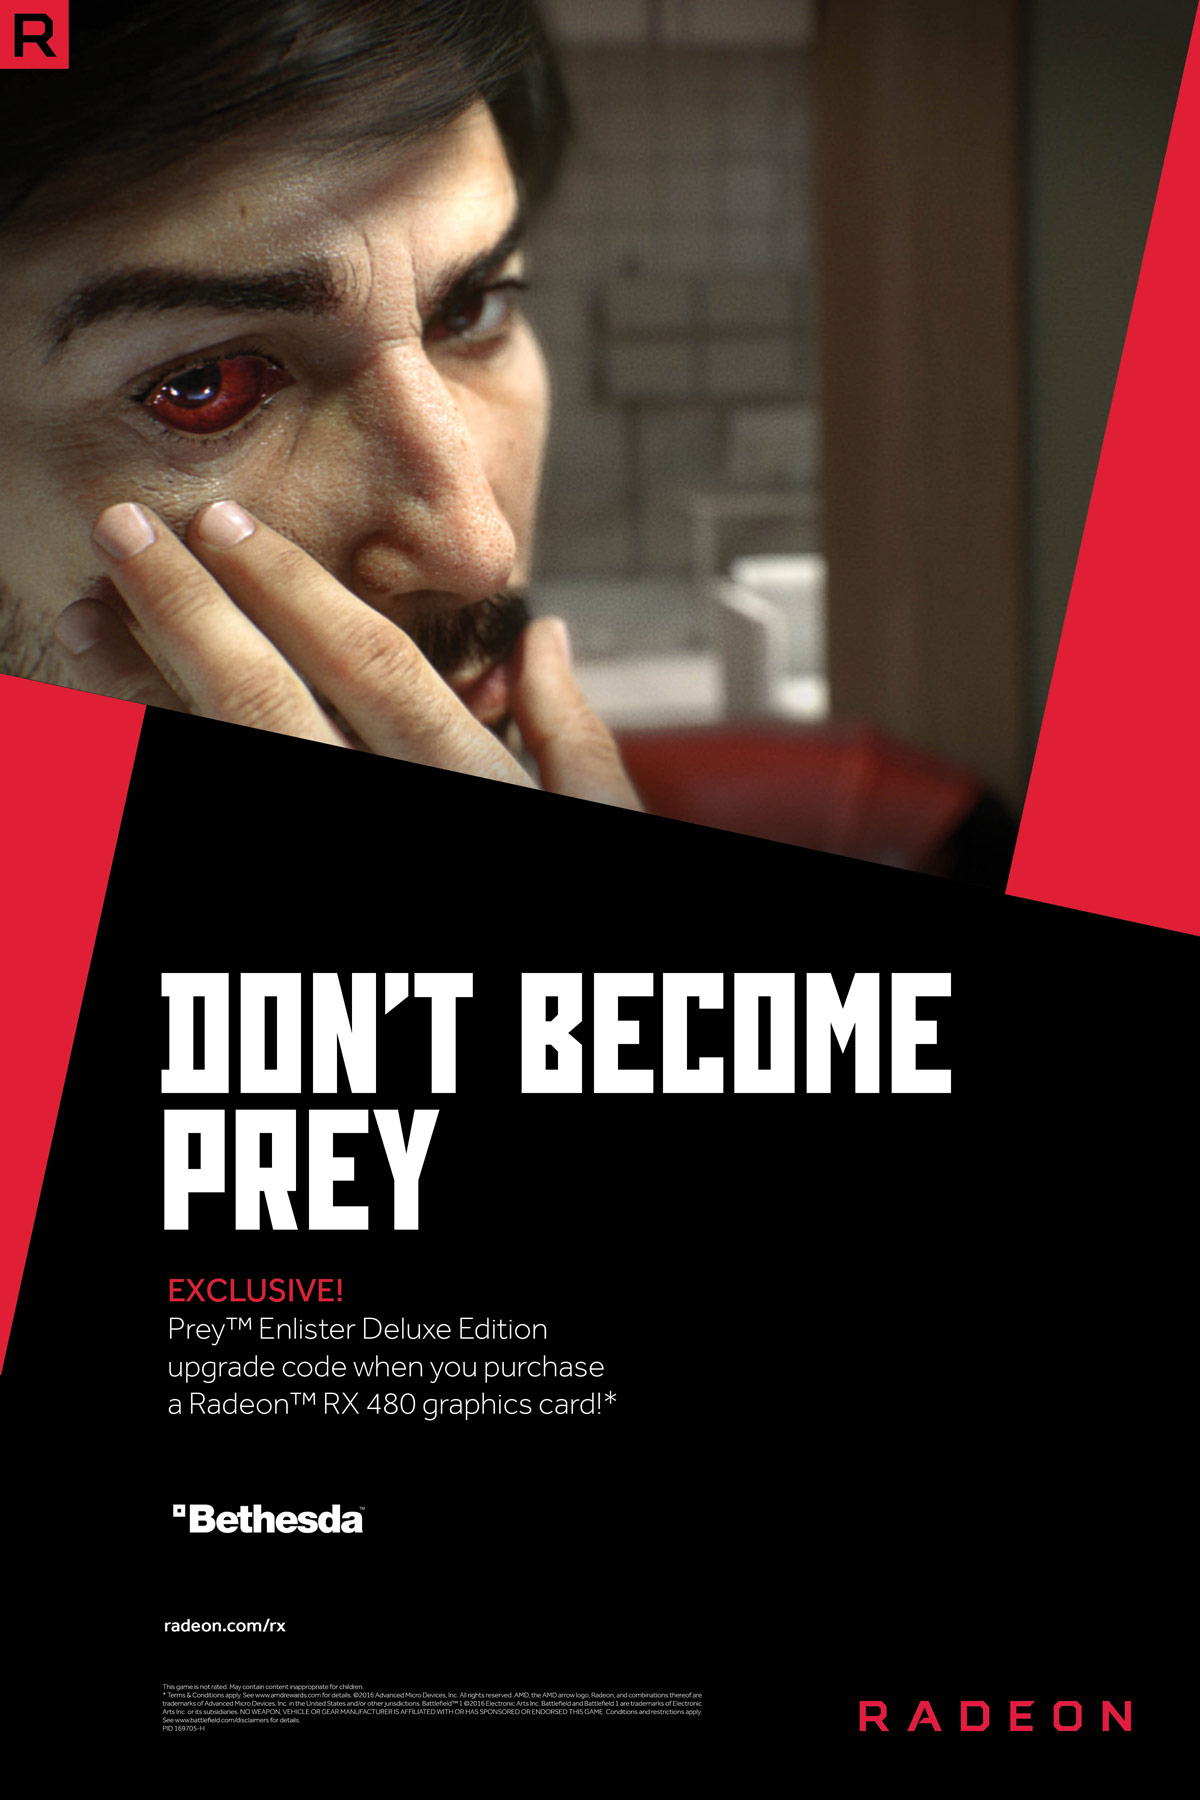 Don't Become Prey by Sabine Handtke